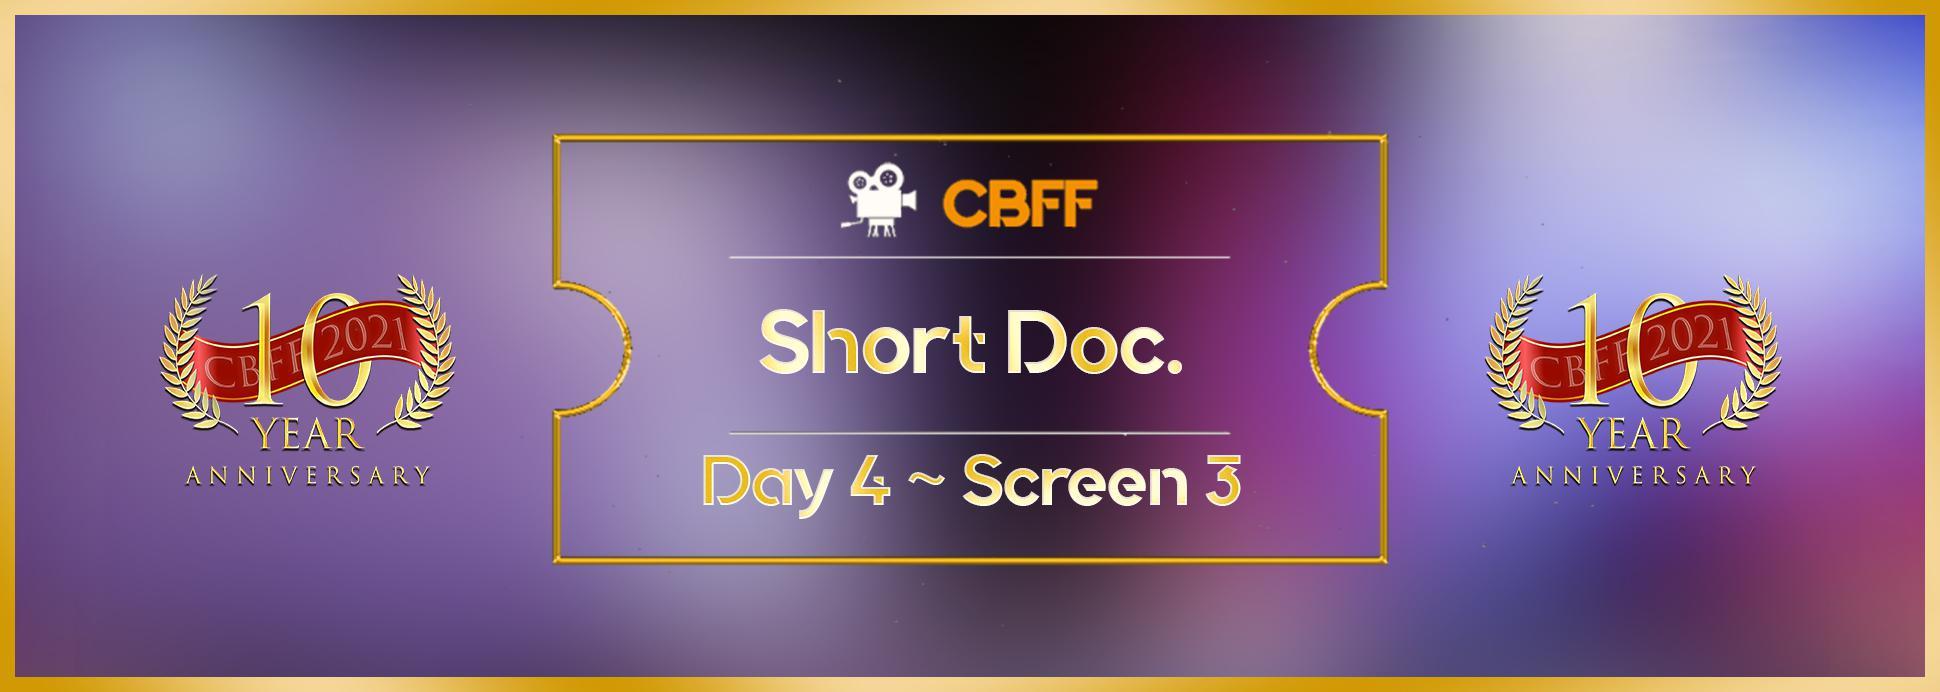 Day 4, Screen 3: Short Documentary 2